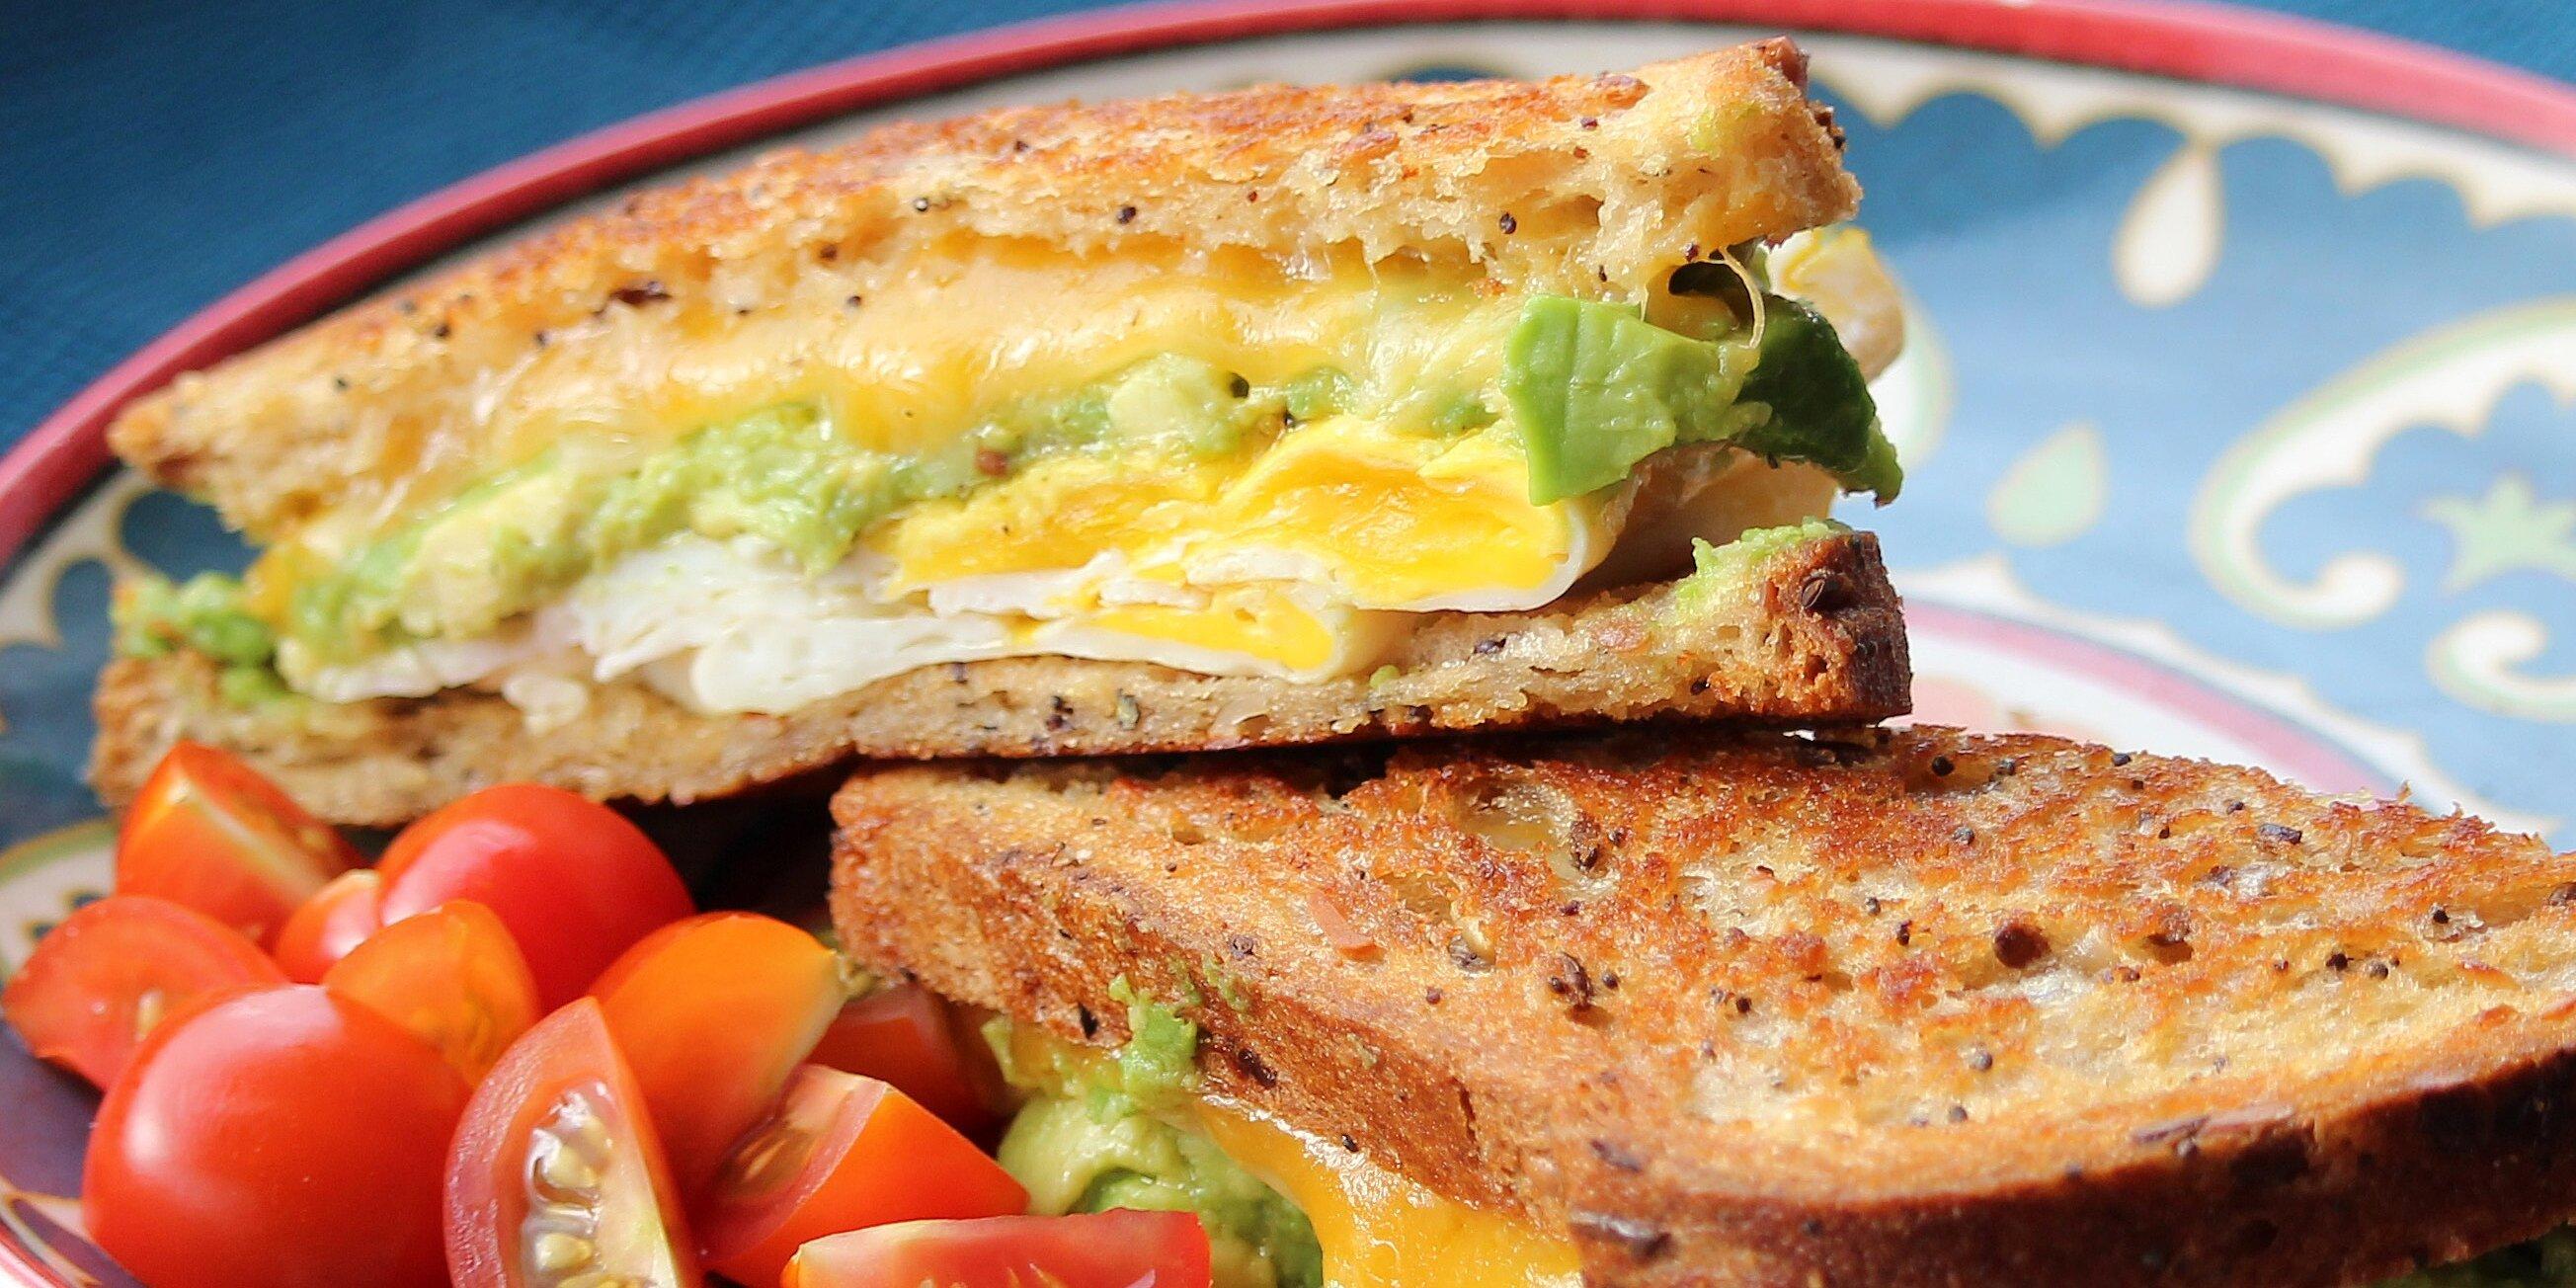 Avocado Breakfast Sandwich Recipe | Allrecipes